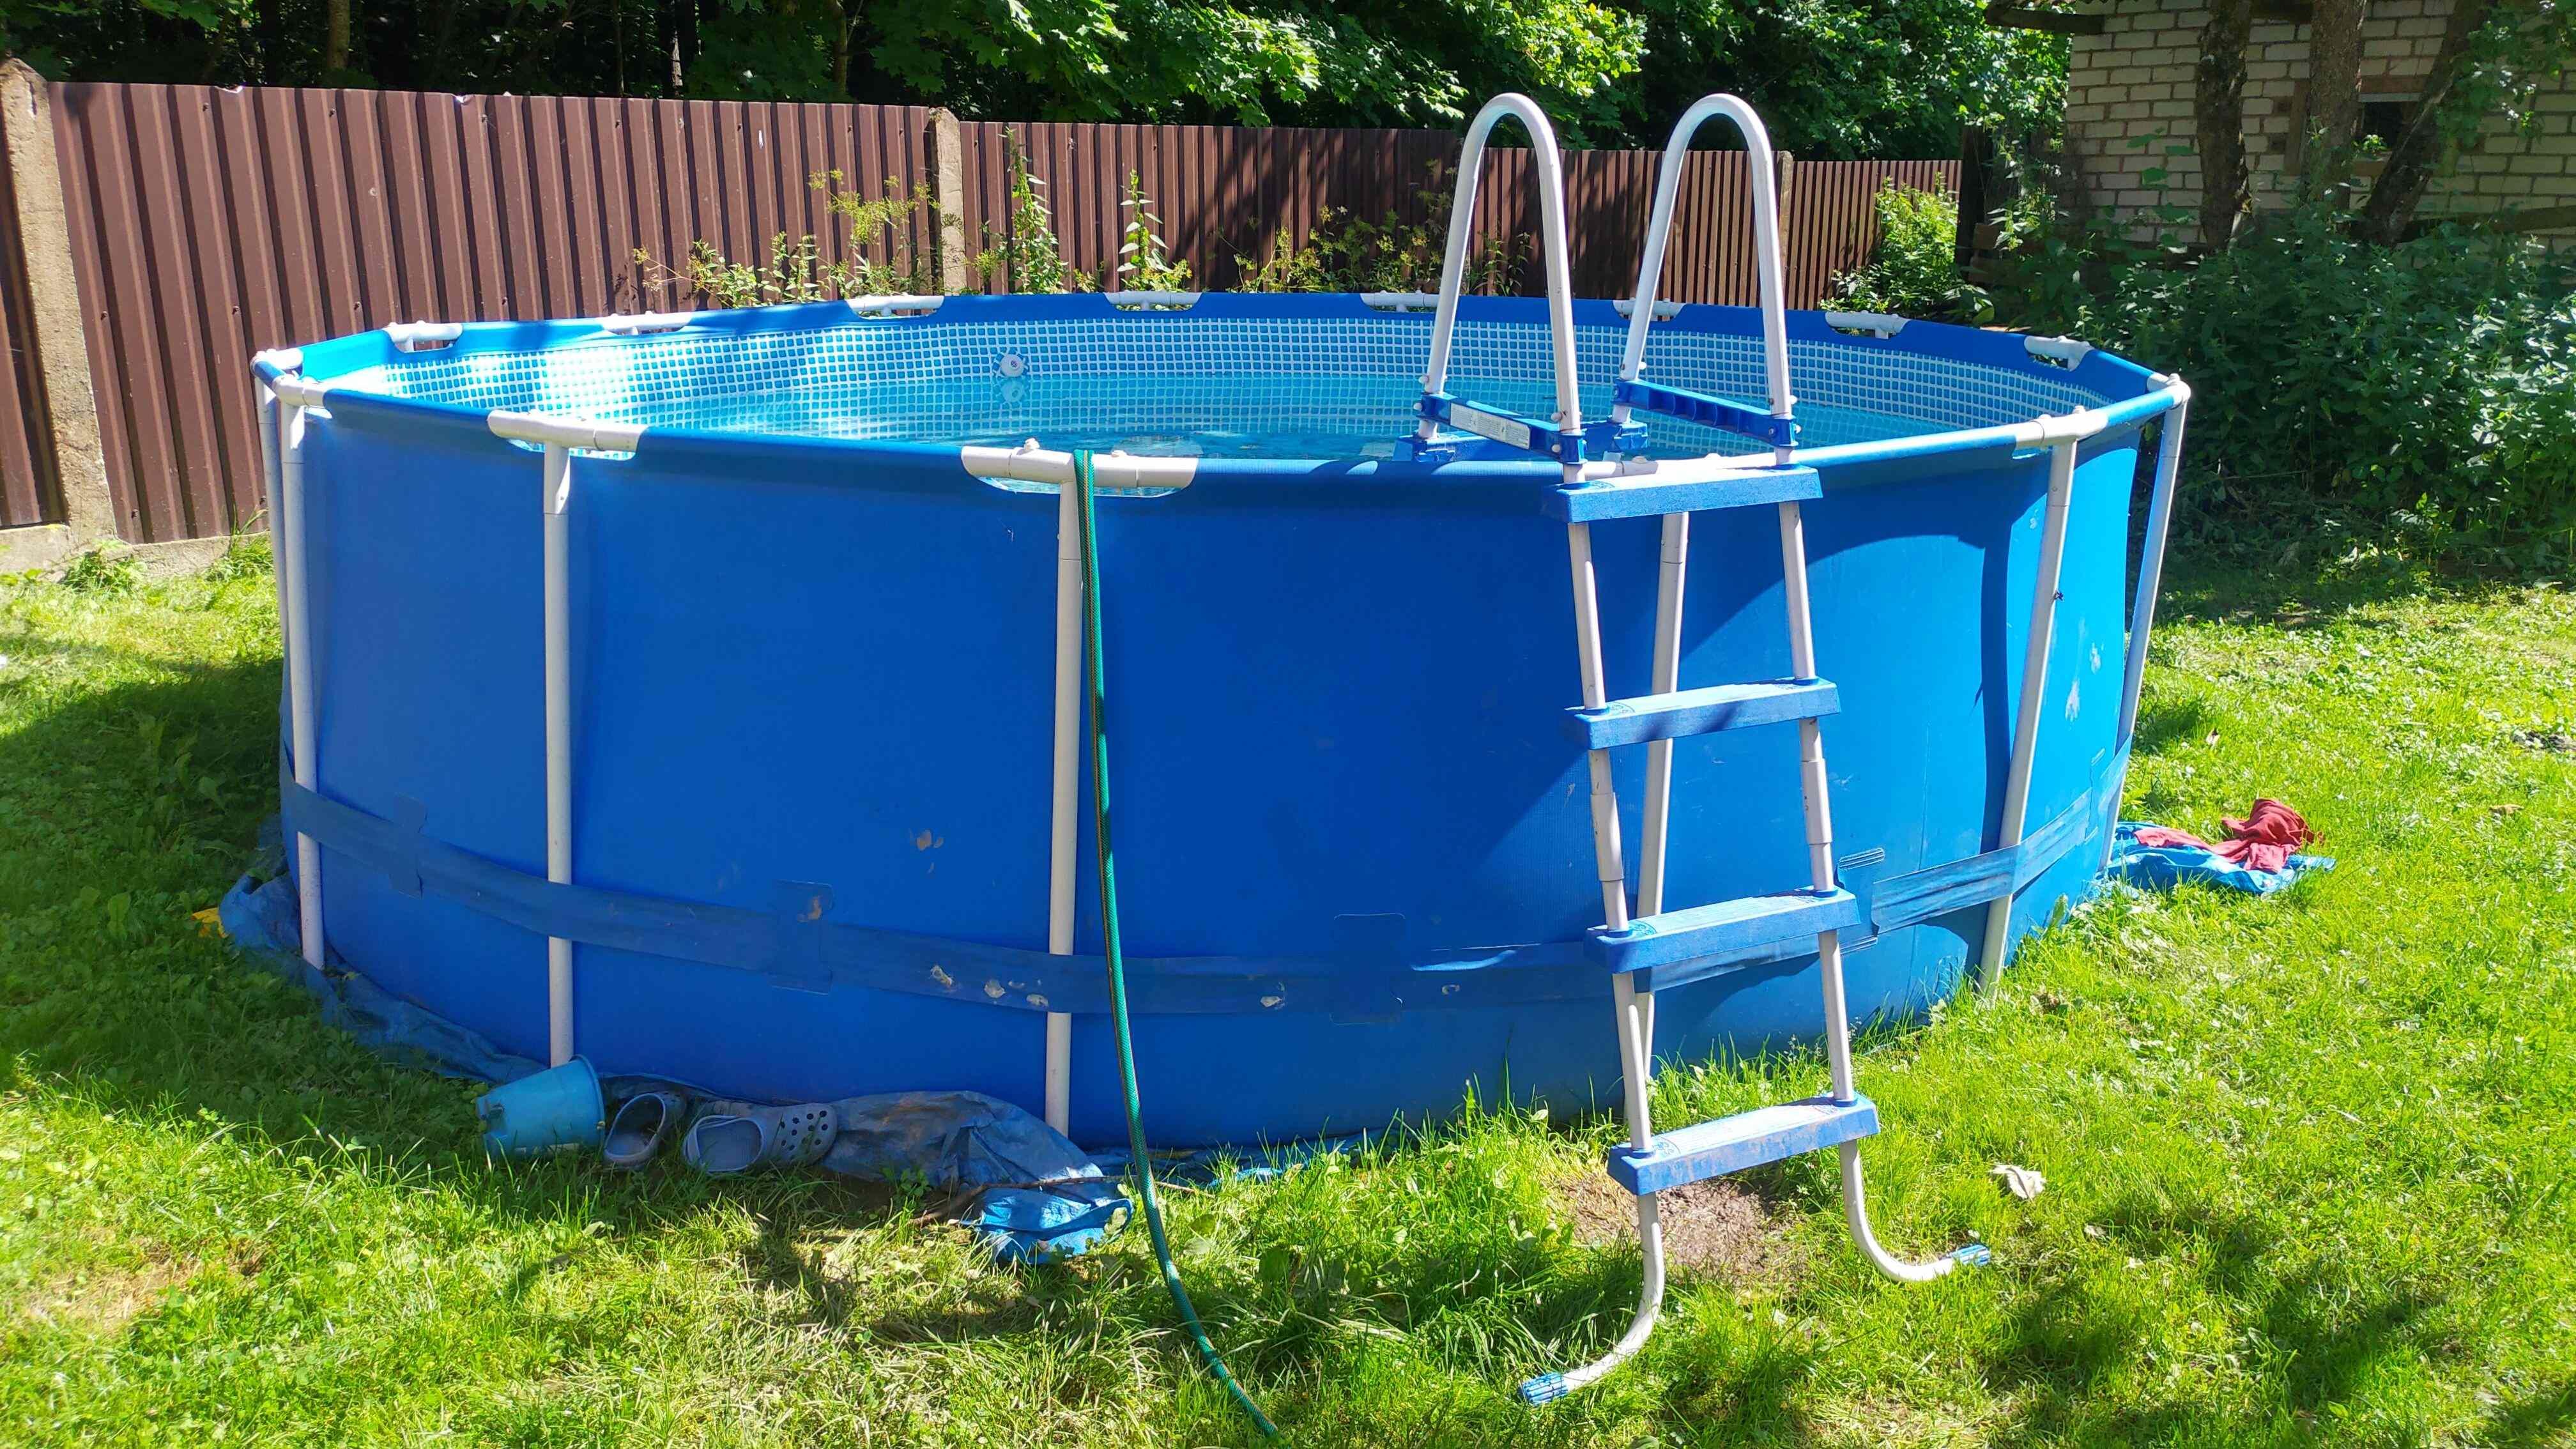 Comment installer une piscine tubulaire